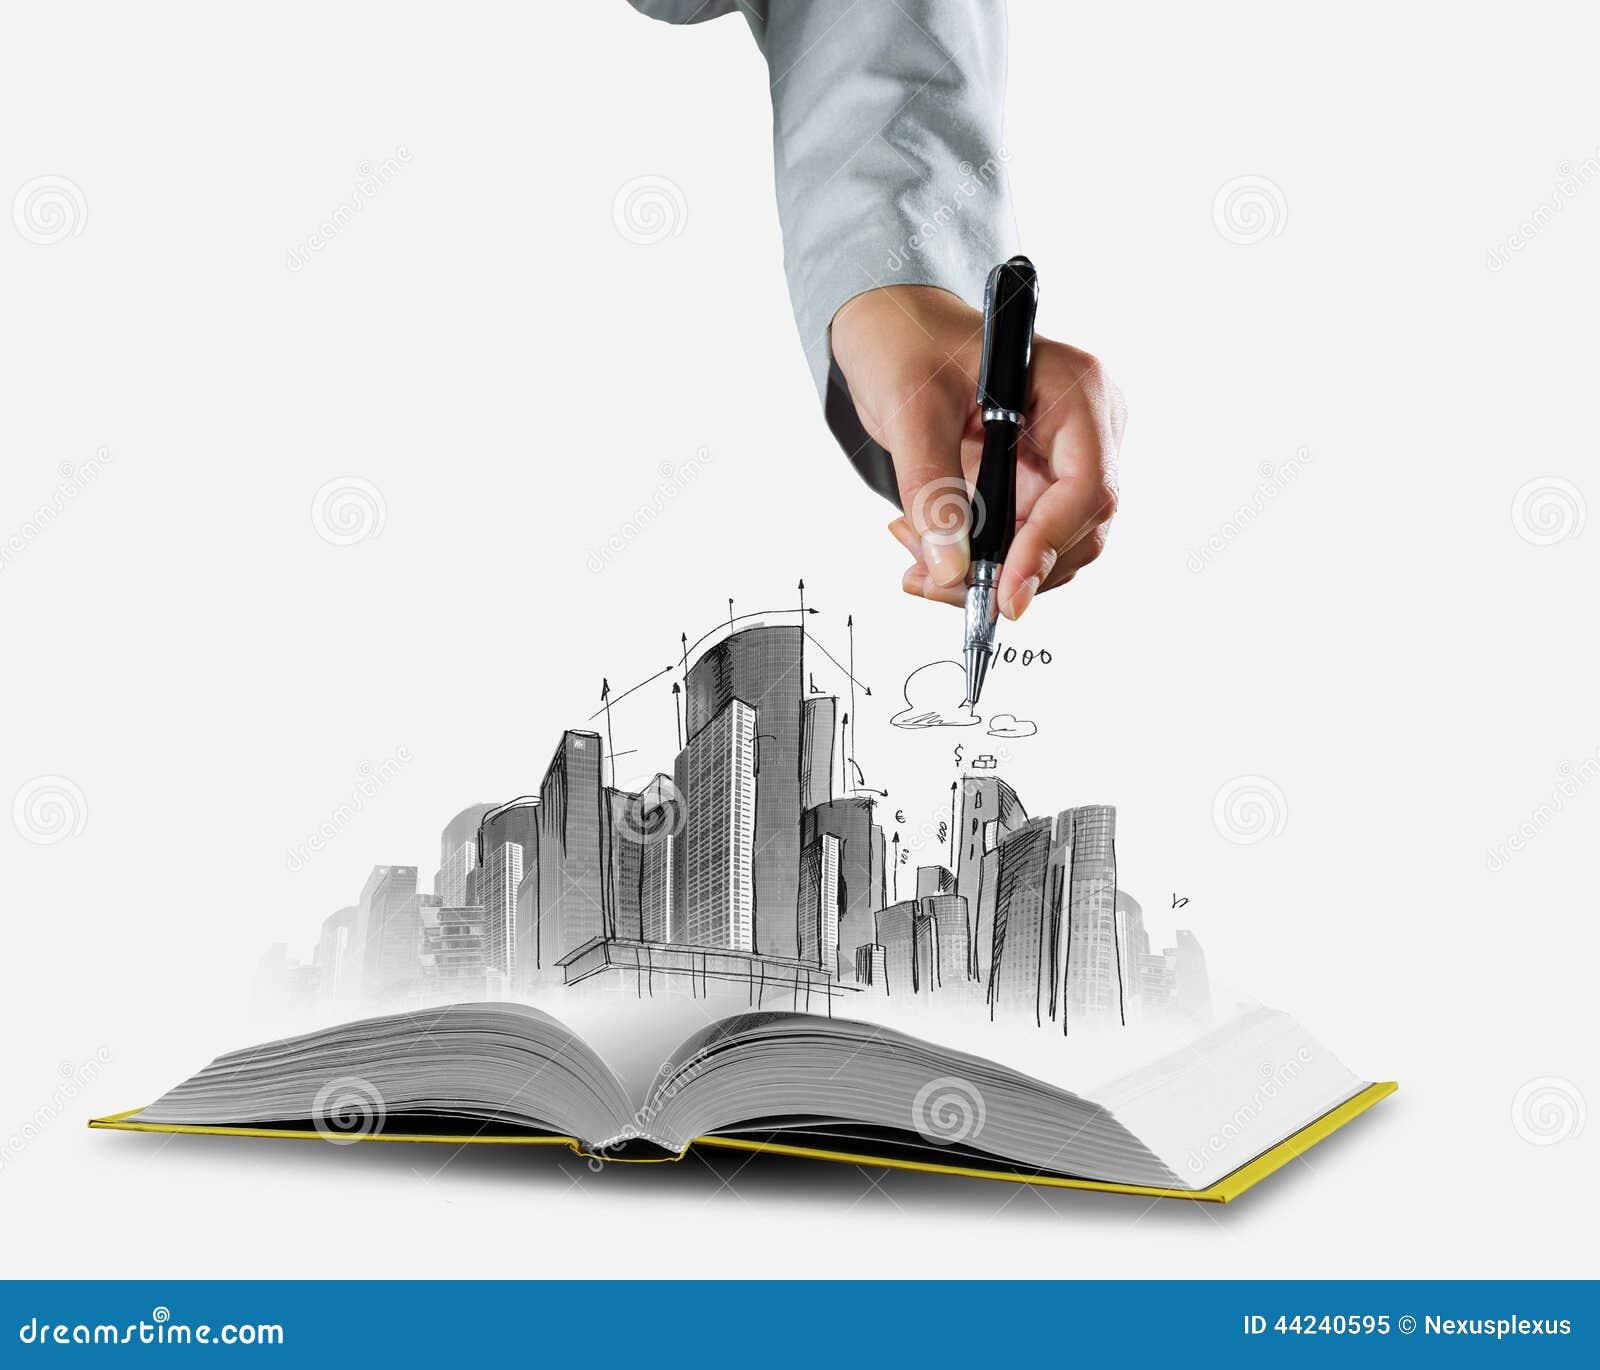 Building Construction Business : Construction business stock photo image